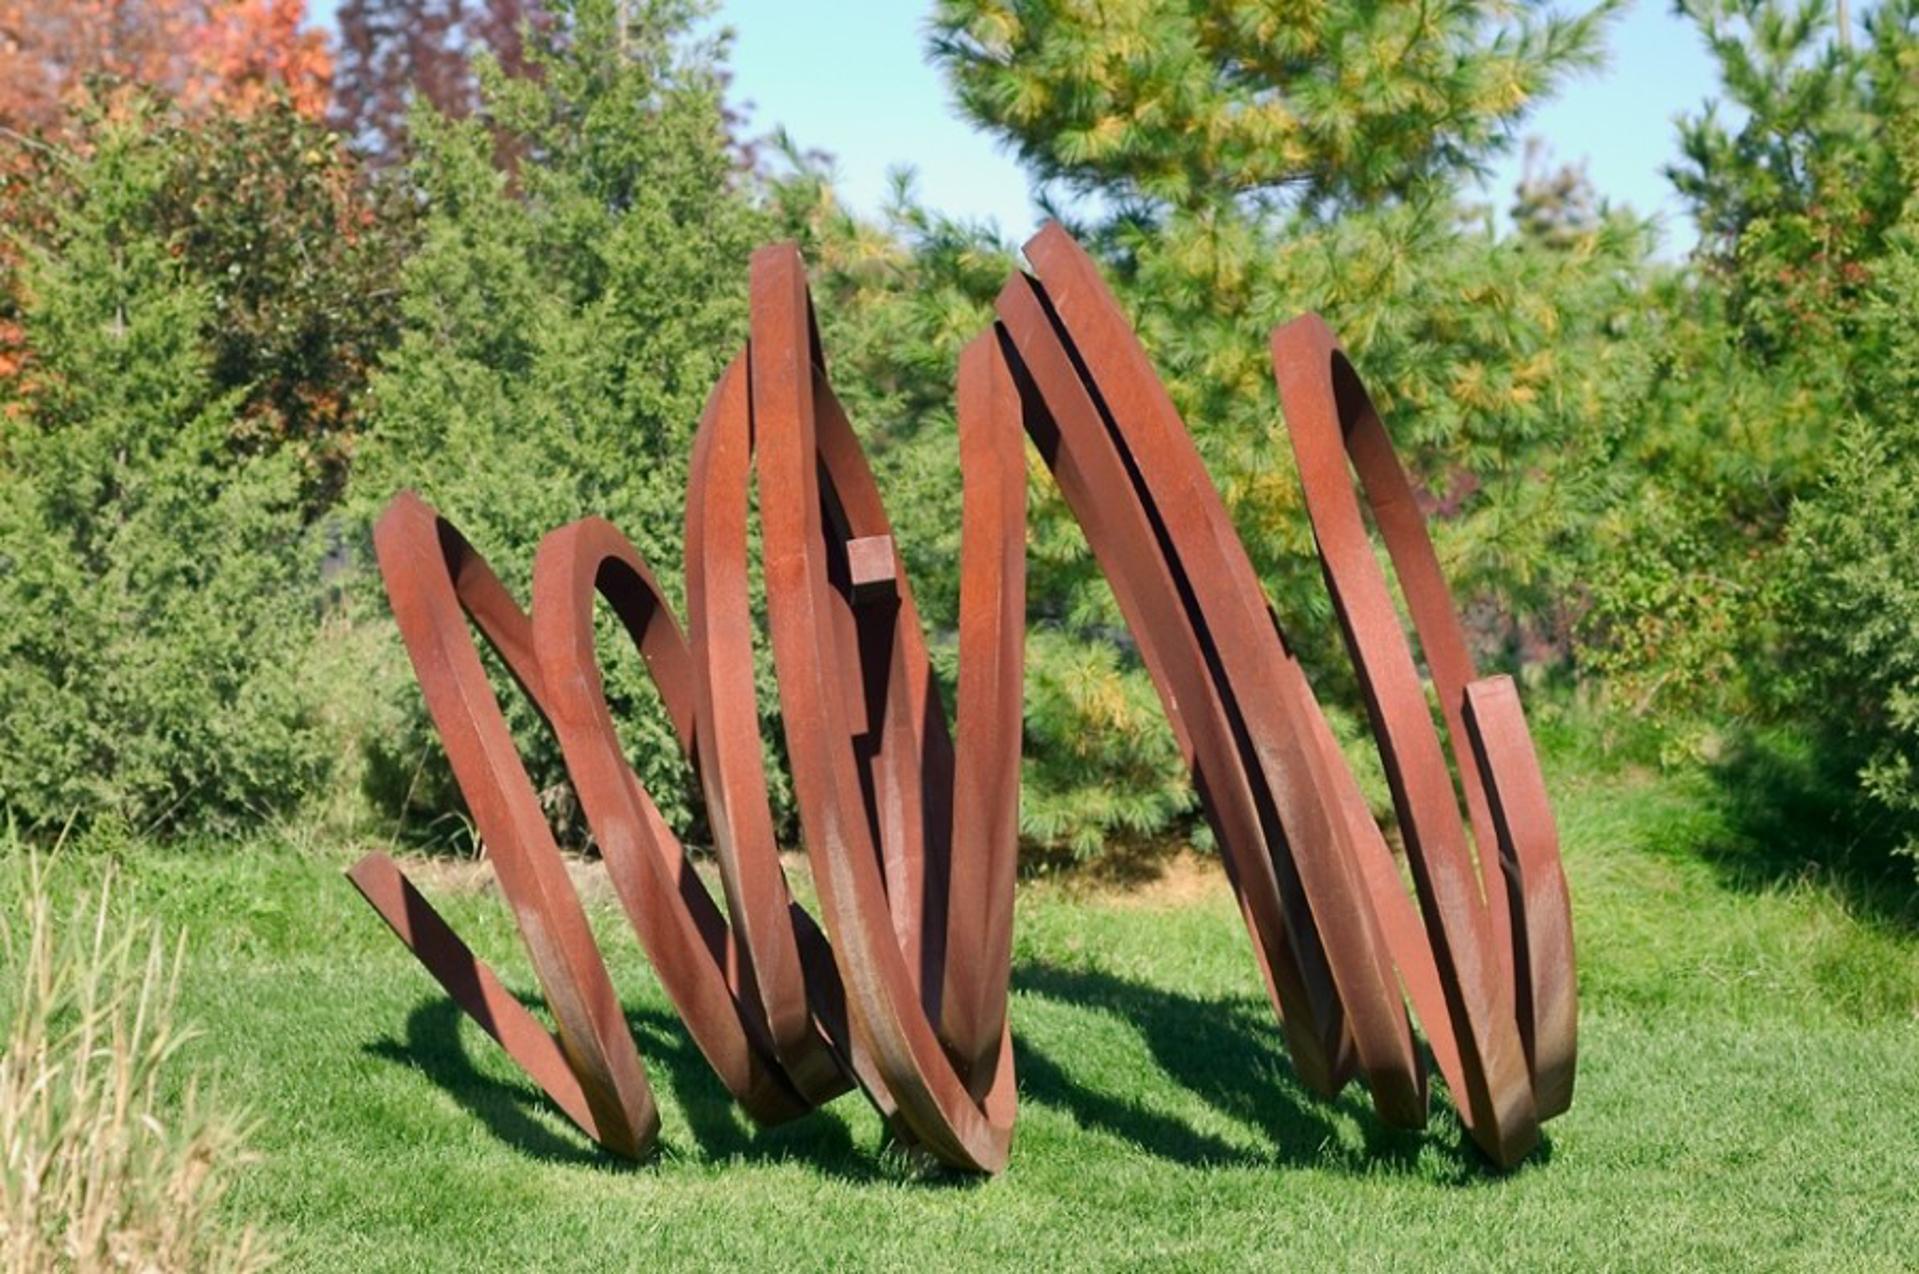 Two Indeterminate Lines by Bernar Venet